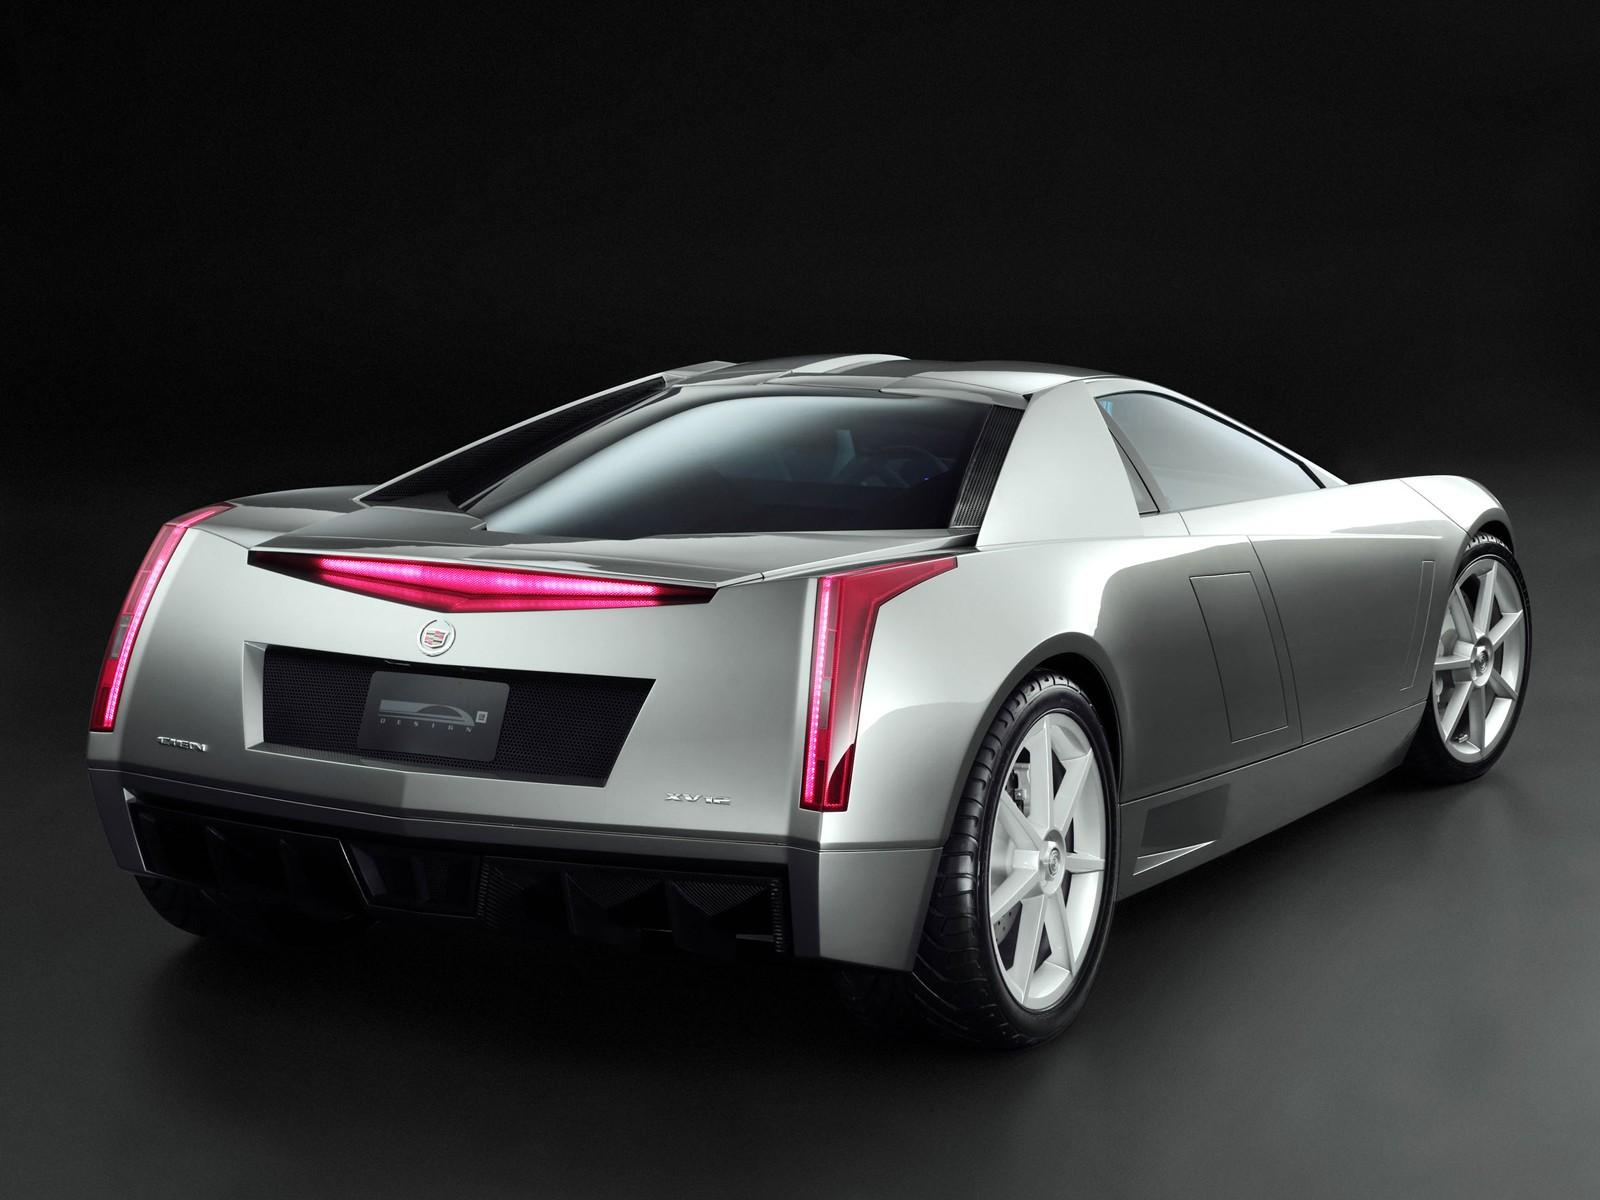 Cadillac-Cien-Concept-008.jpg